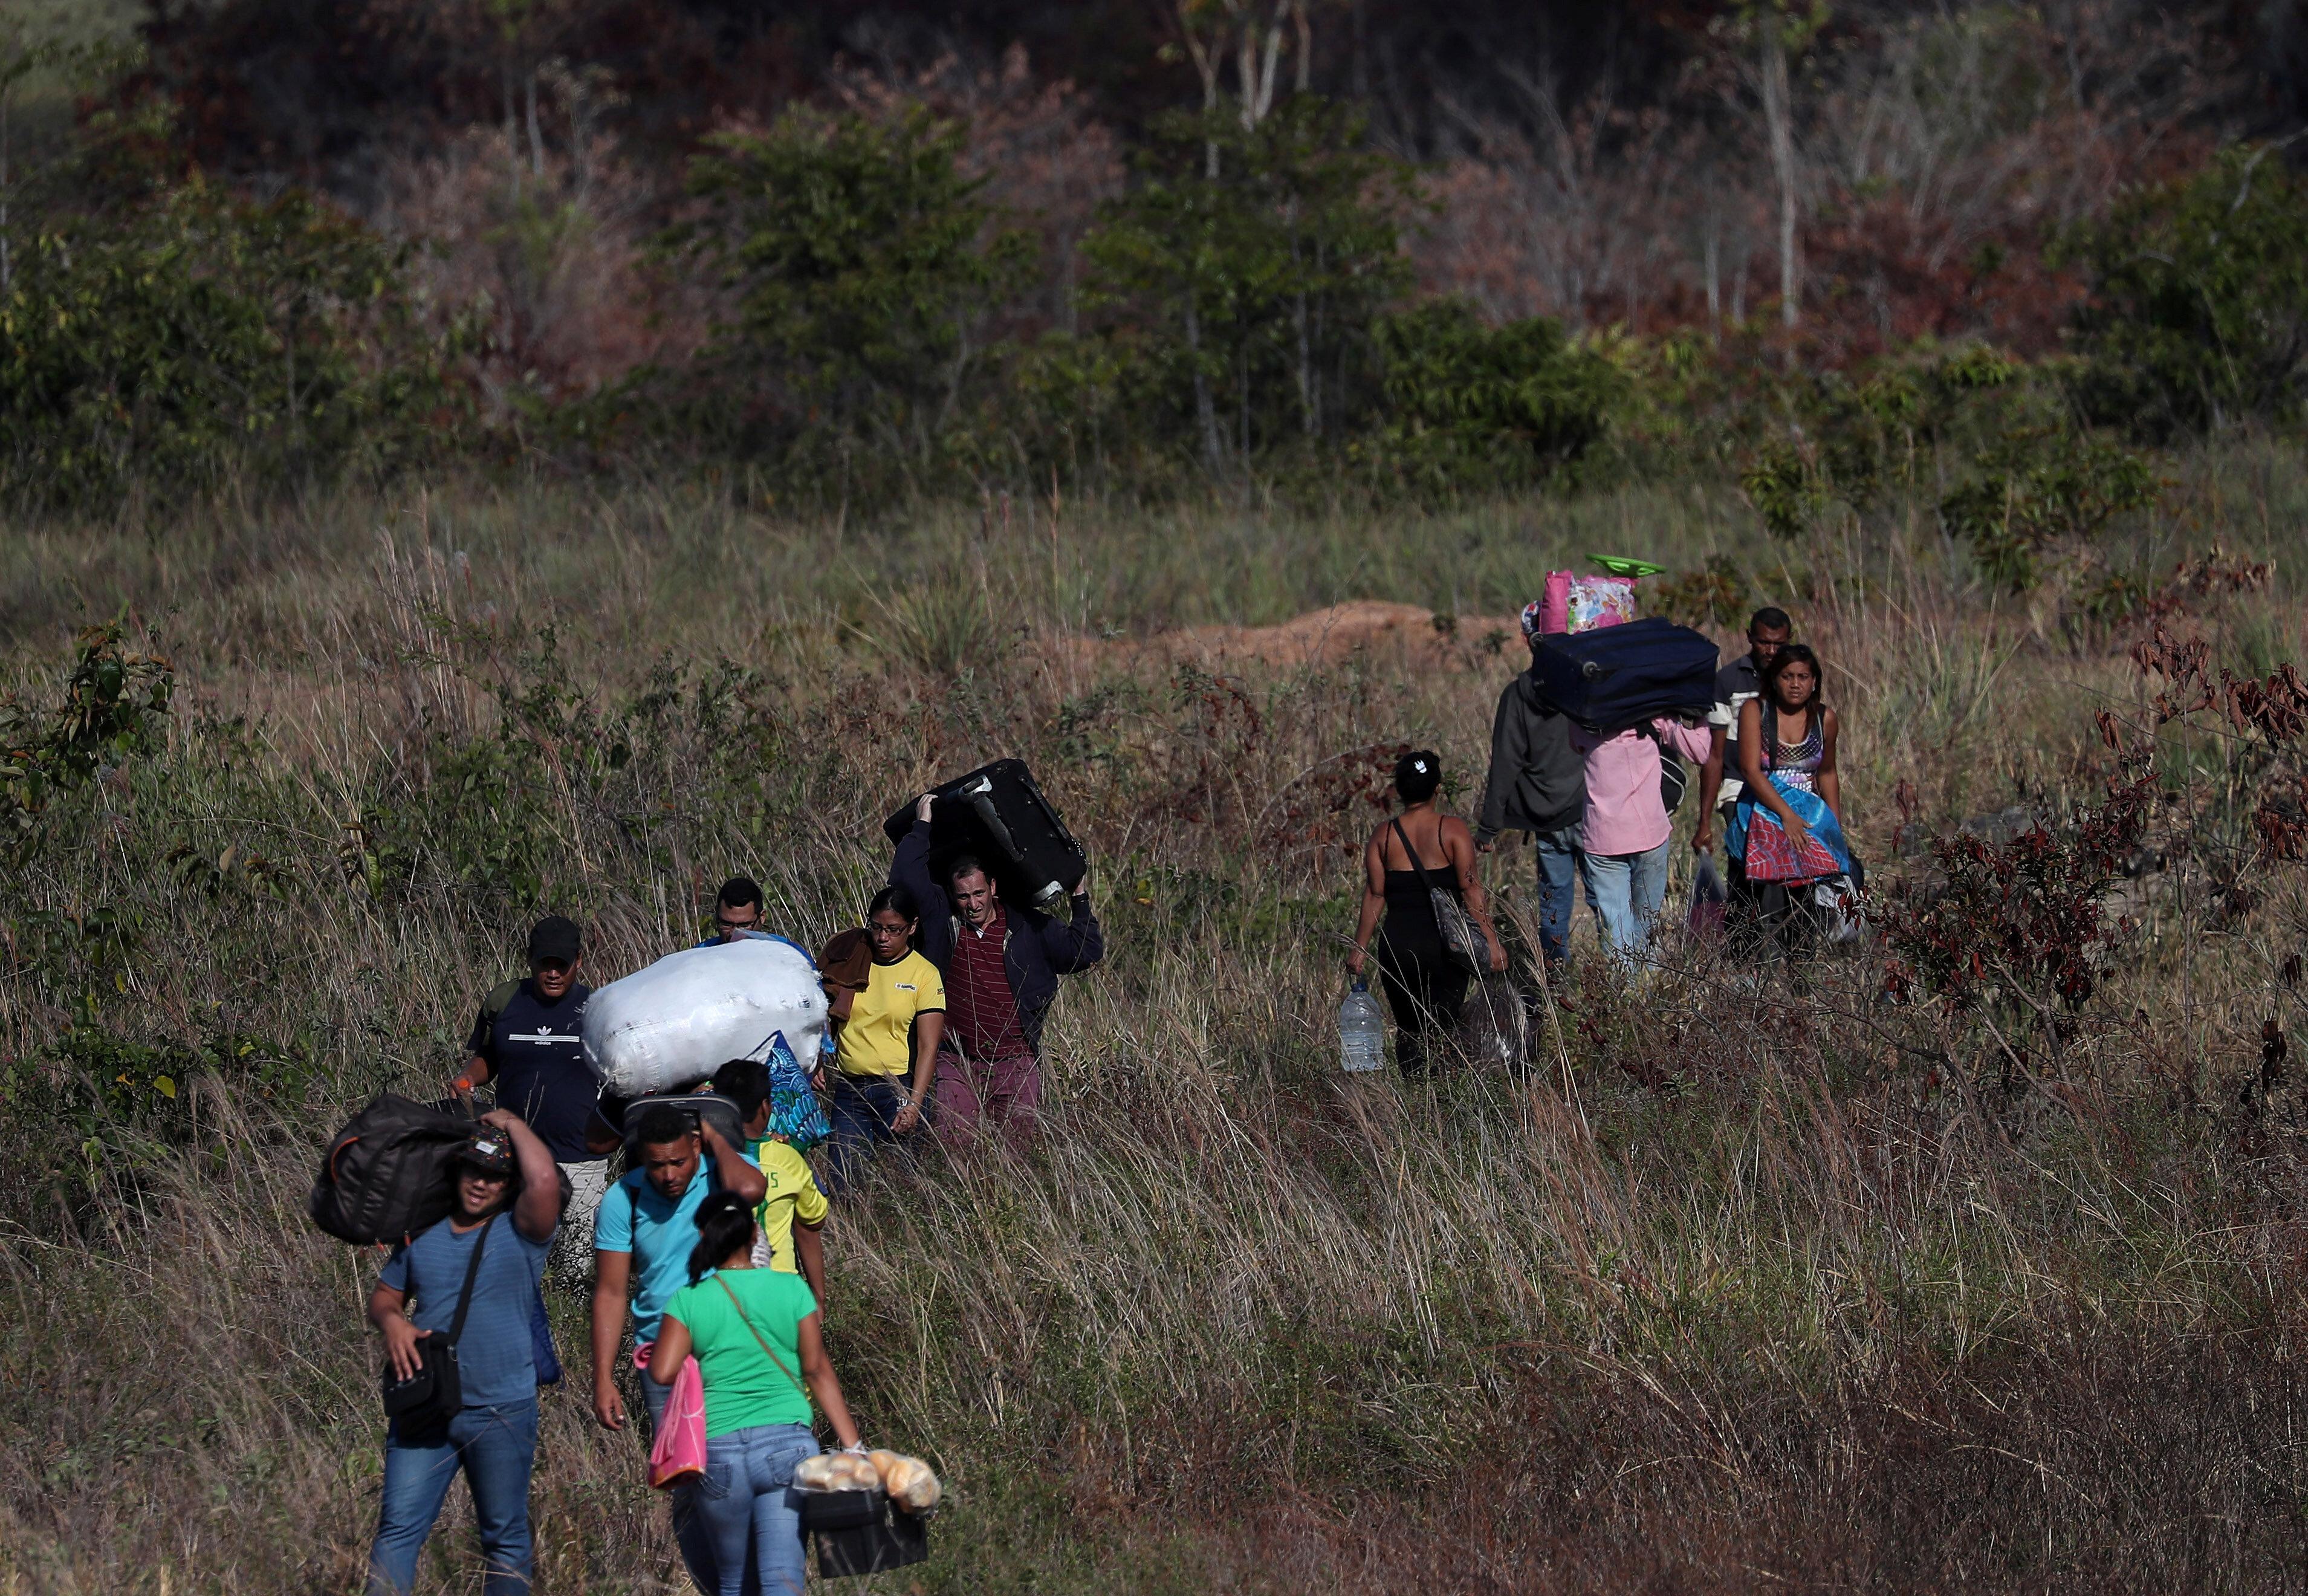 On The Brazil Border, Venezuela's Political Crisis Has Become A Humanitarian Nightmare